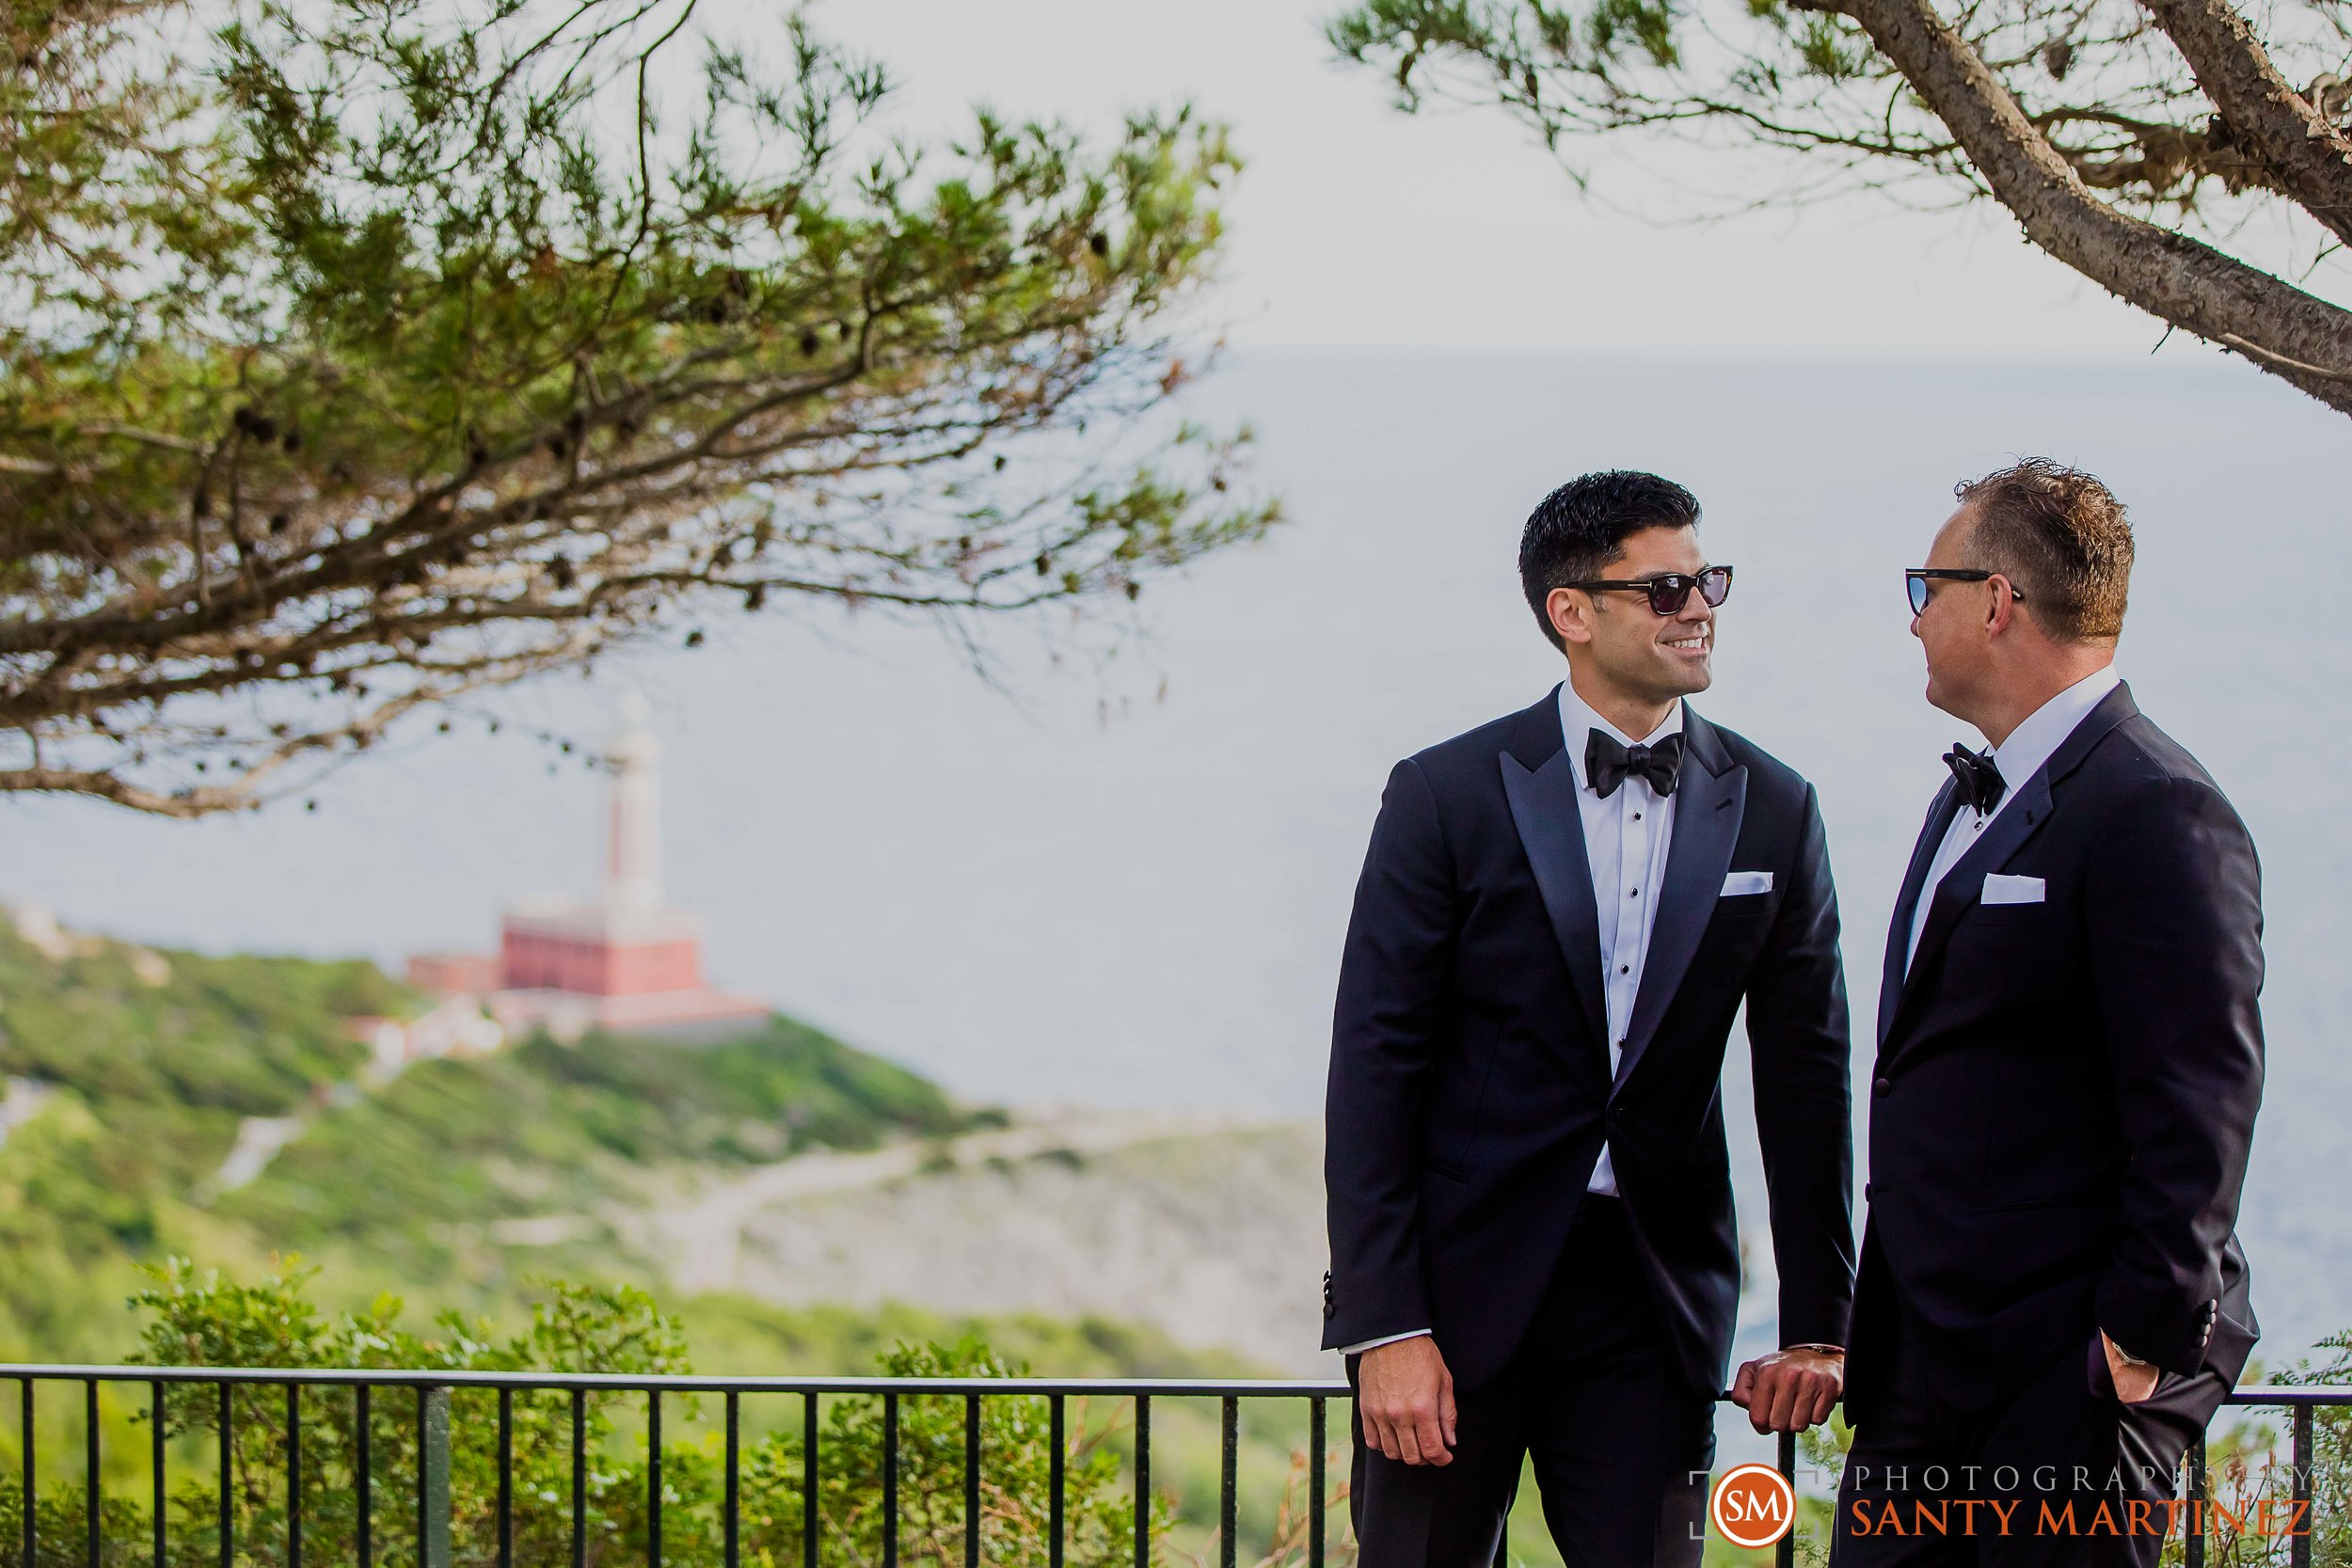 Wedding Capri Italy - Photography by Santy Martinez-39.jpg